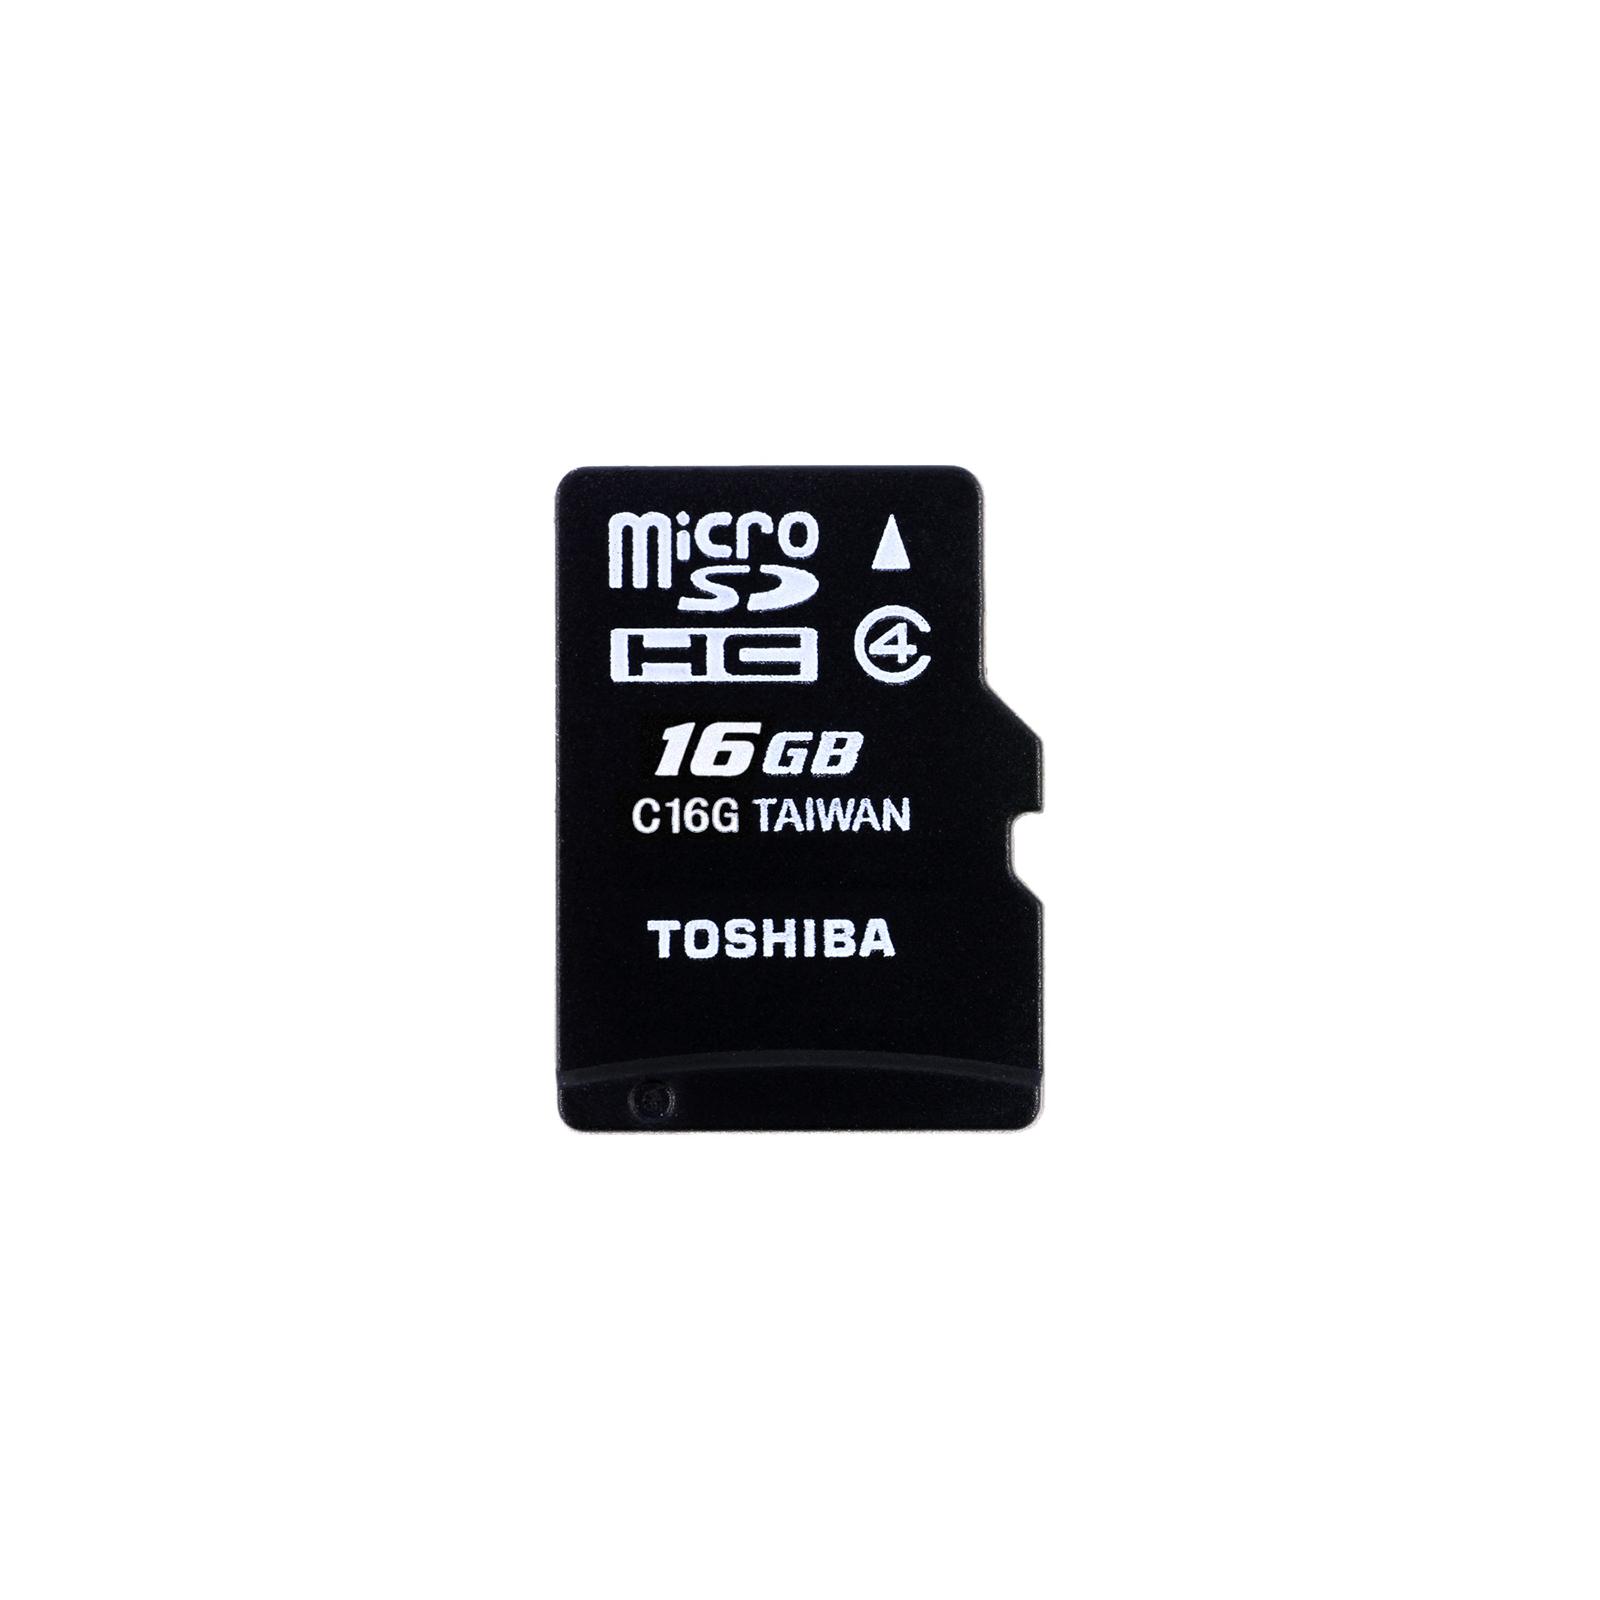 Карта памяти TOSHIBA 16GB microSDHC Class 4 (THN-M102K0160M2)